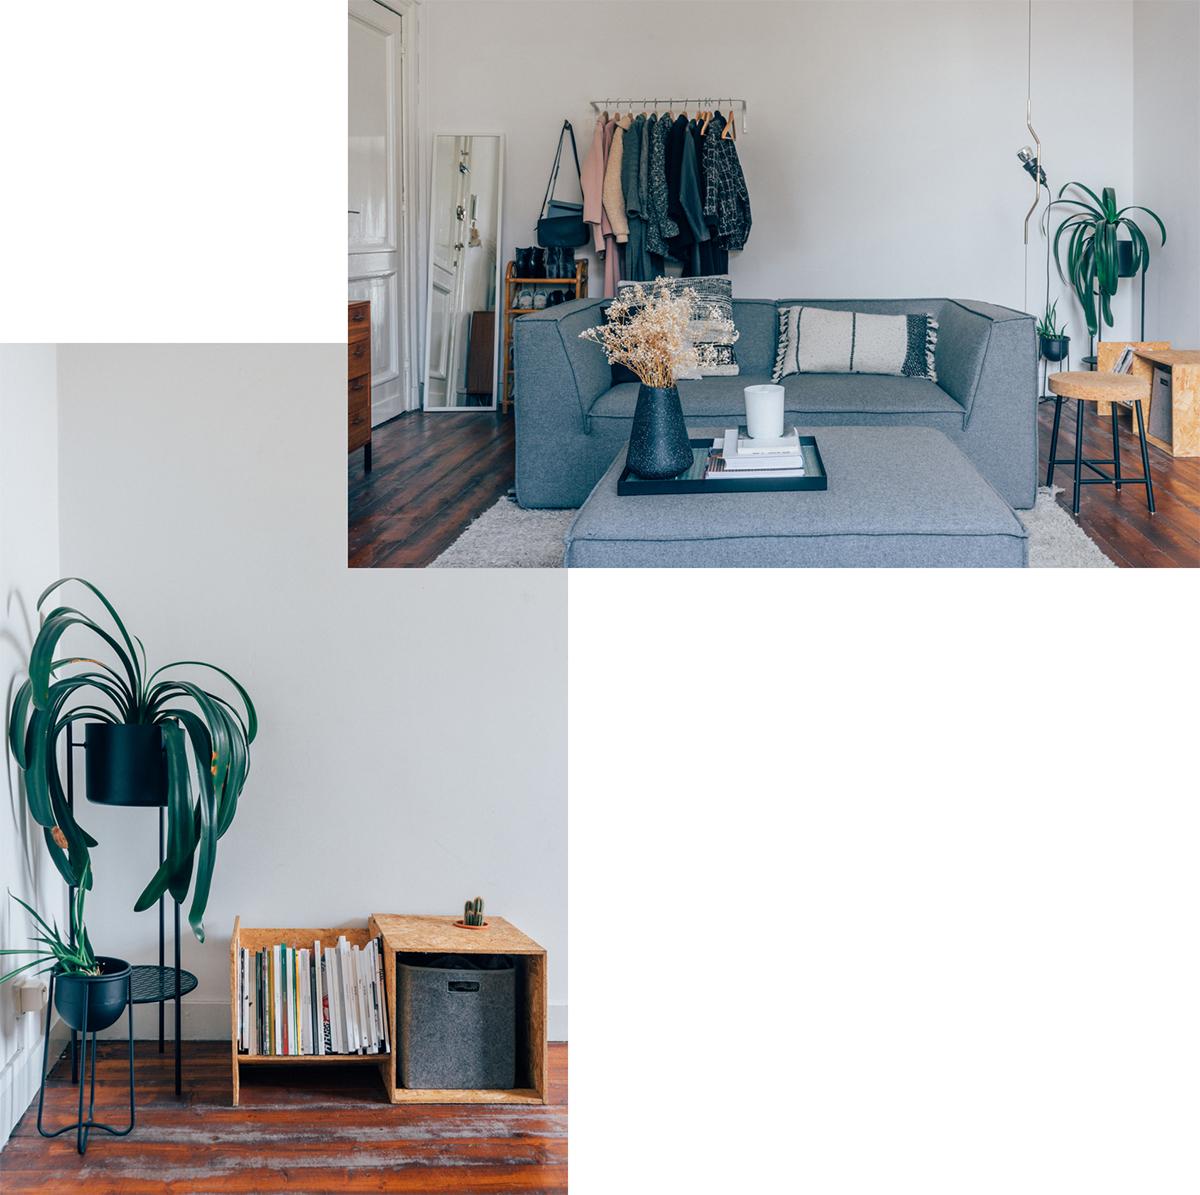 FRAGMENTS_ living room update - Hannelore Veelaert for aupaysdesmerveillesblog.be